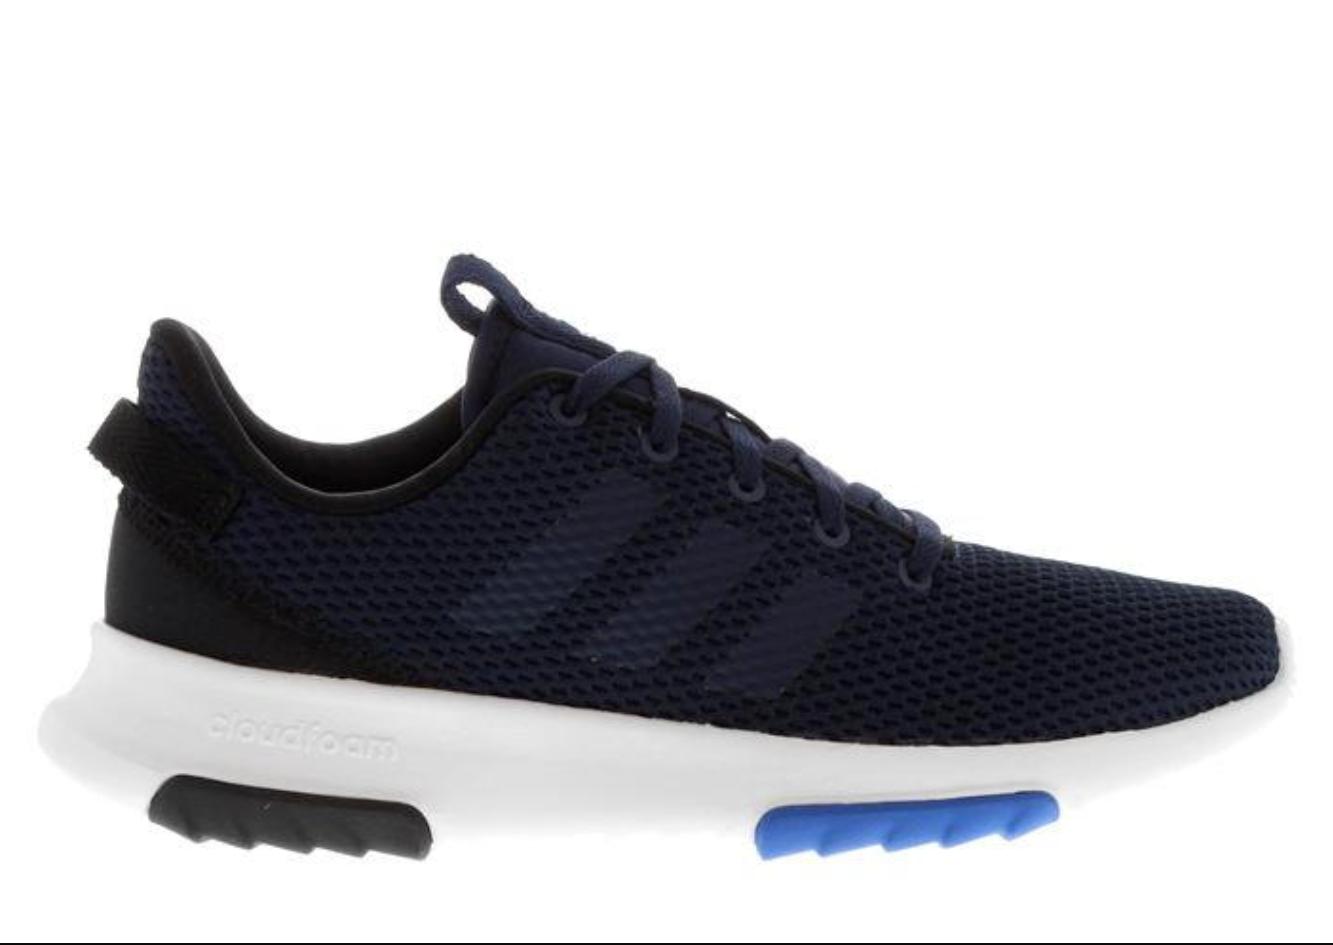 Adidas CF Racer Cloudfoam  Herren UK 9.5 EU 44 Navy / Weiß Running Schuhes Trainers